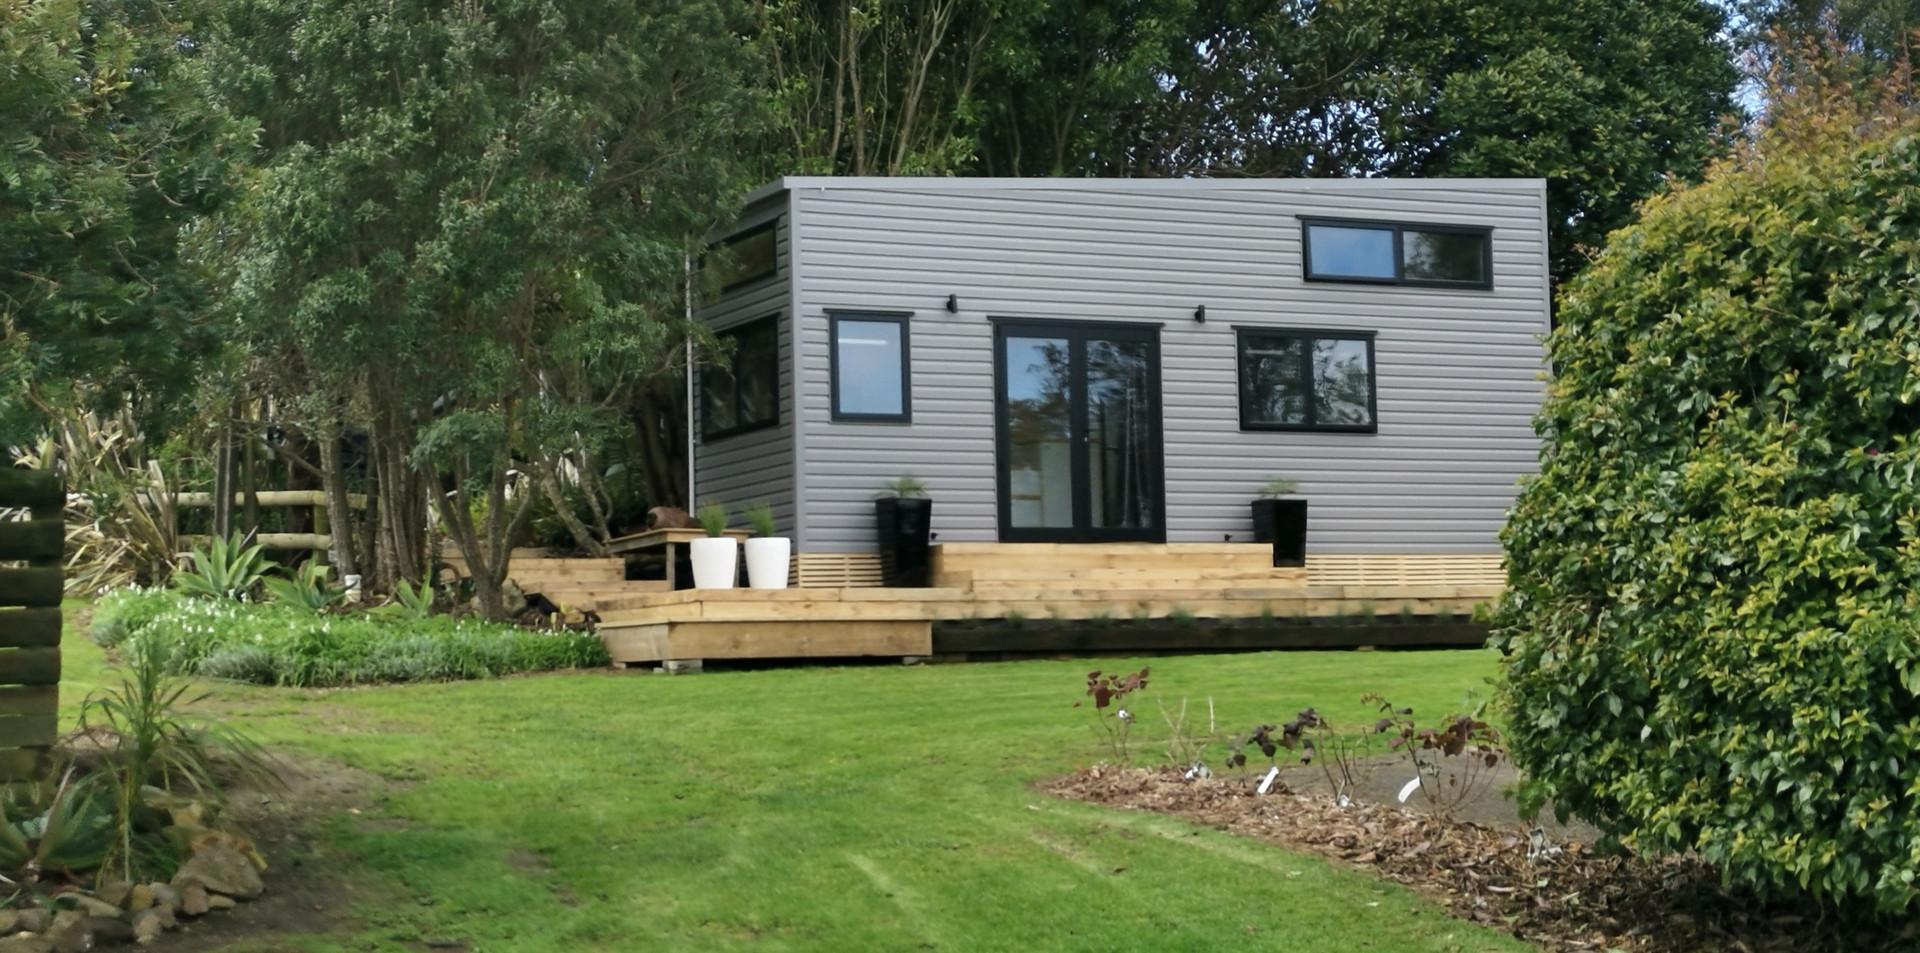 Green Hill Farm Tiny House.jpg